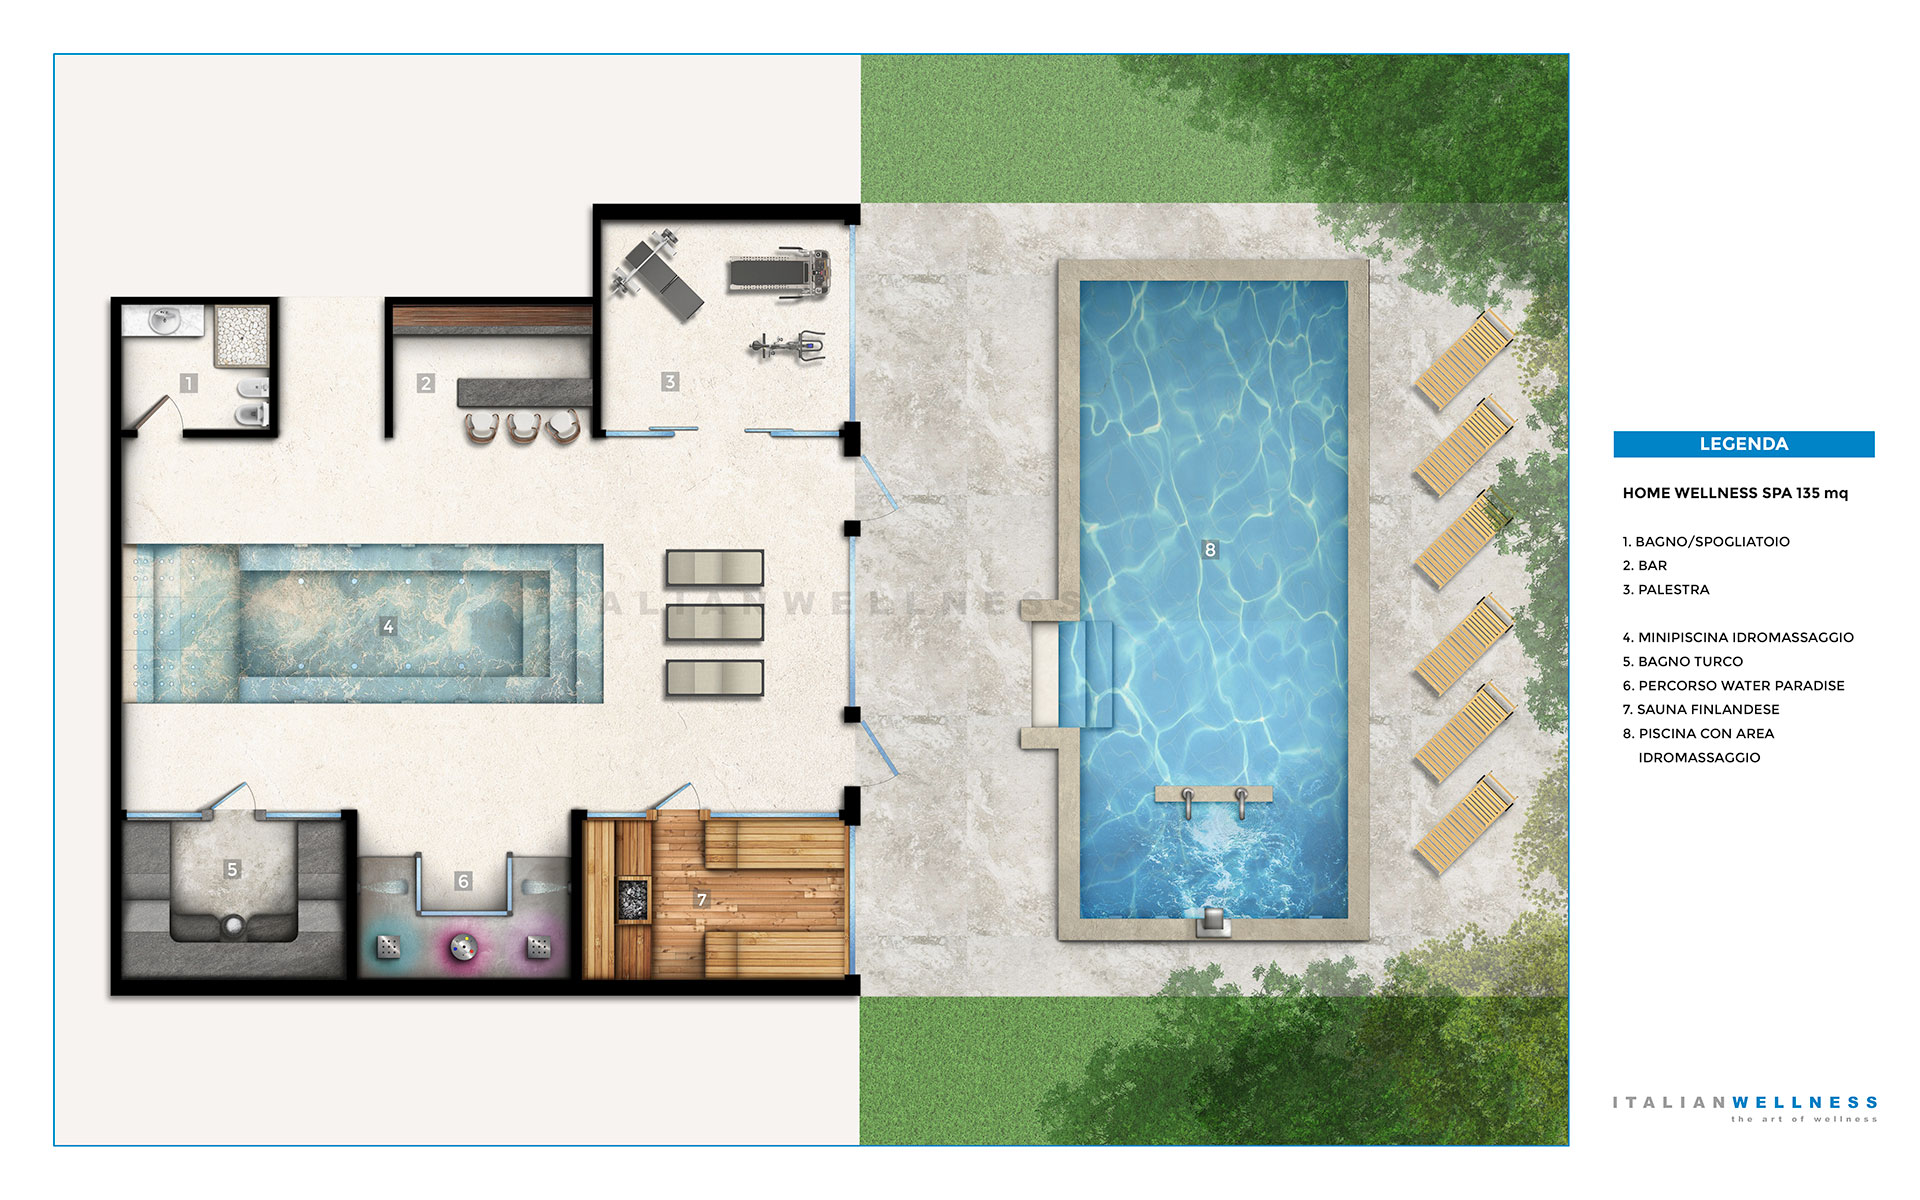 italian-wellness-costruzione-home-wellness-spa-in-casa